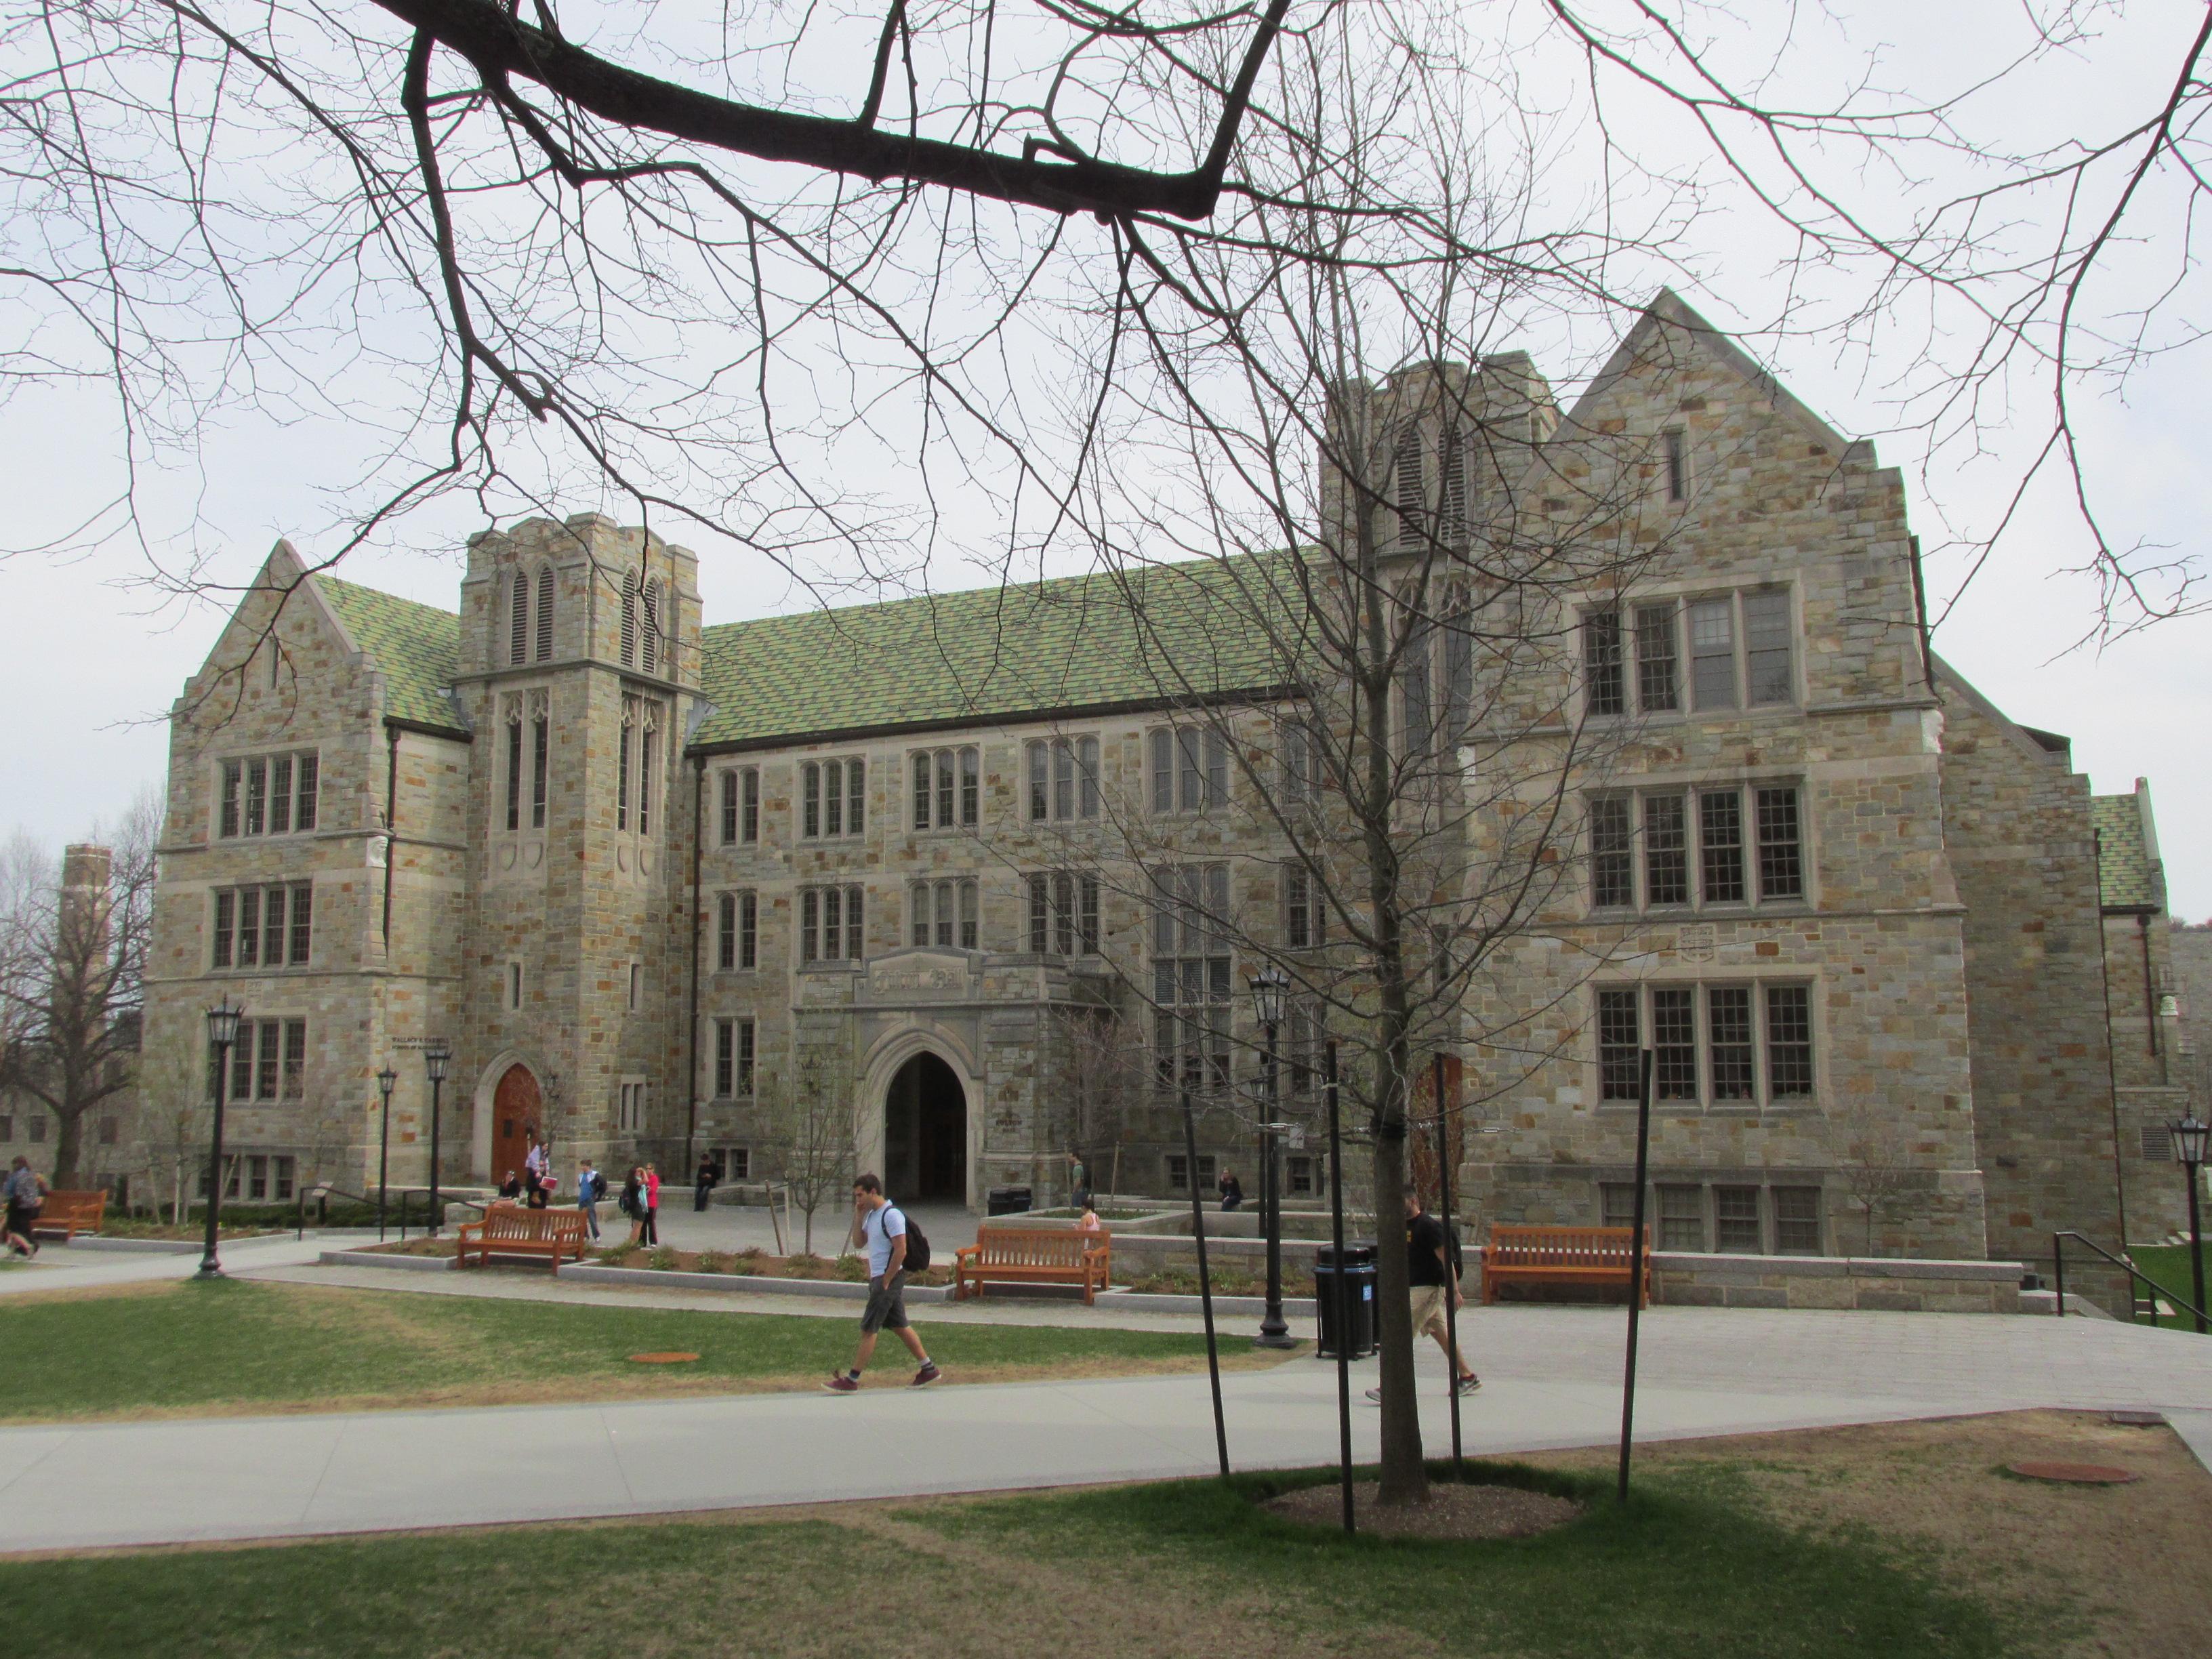 Boston College Mba Resume Template - Resume